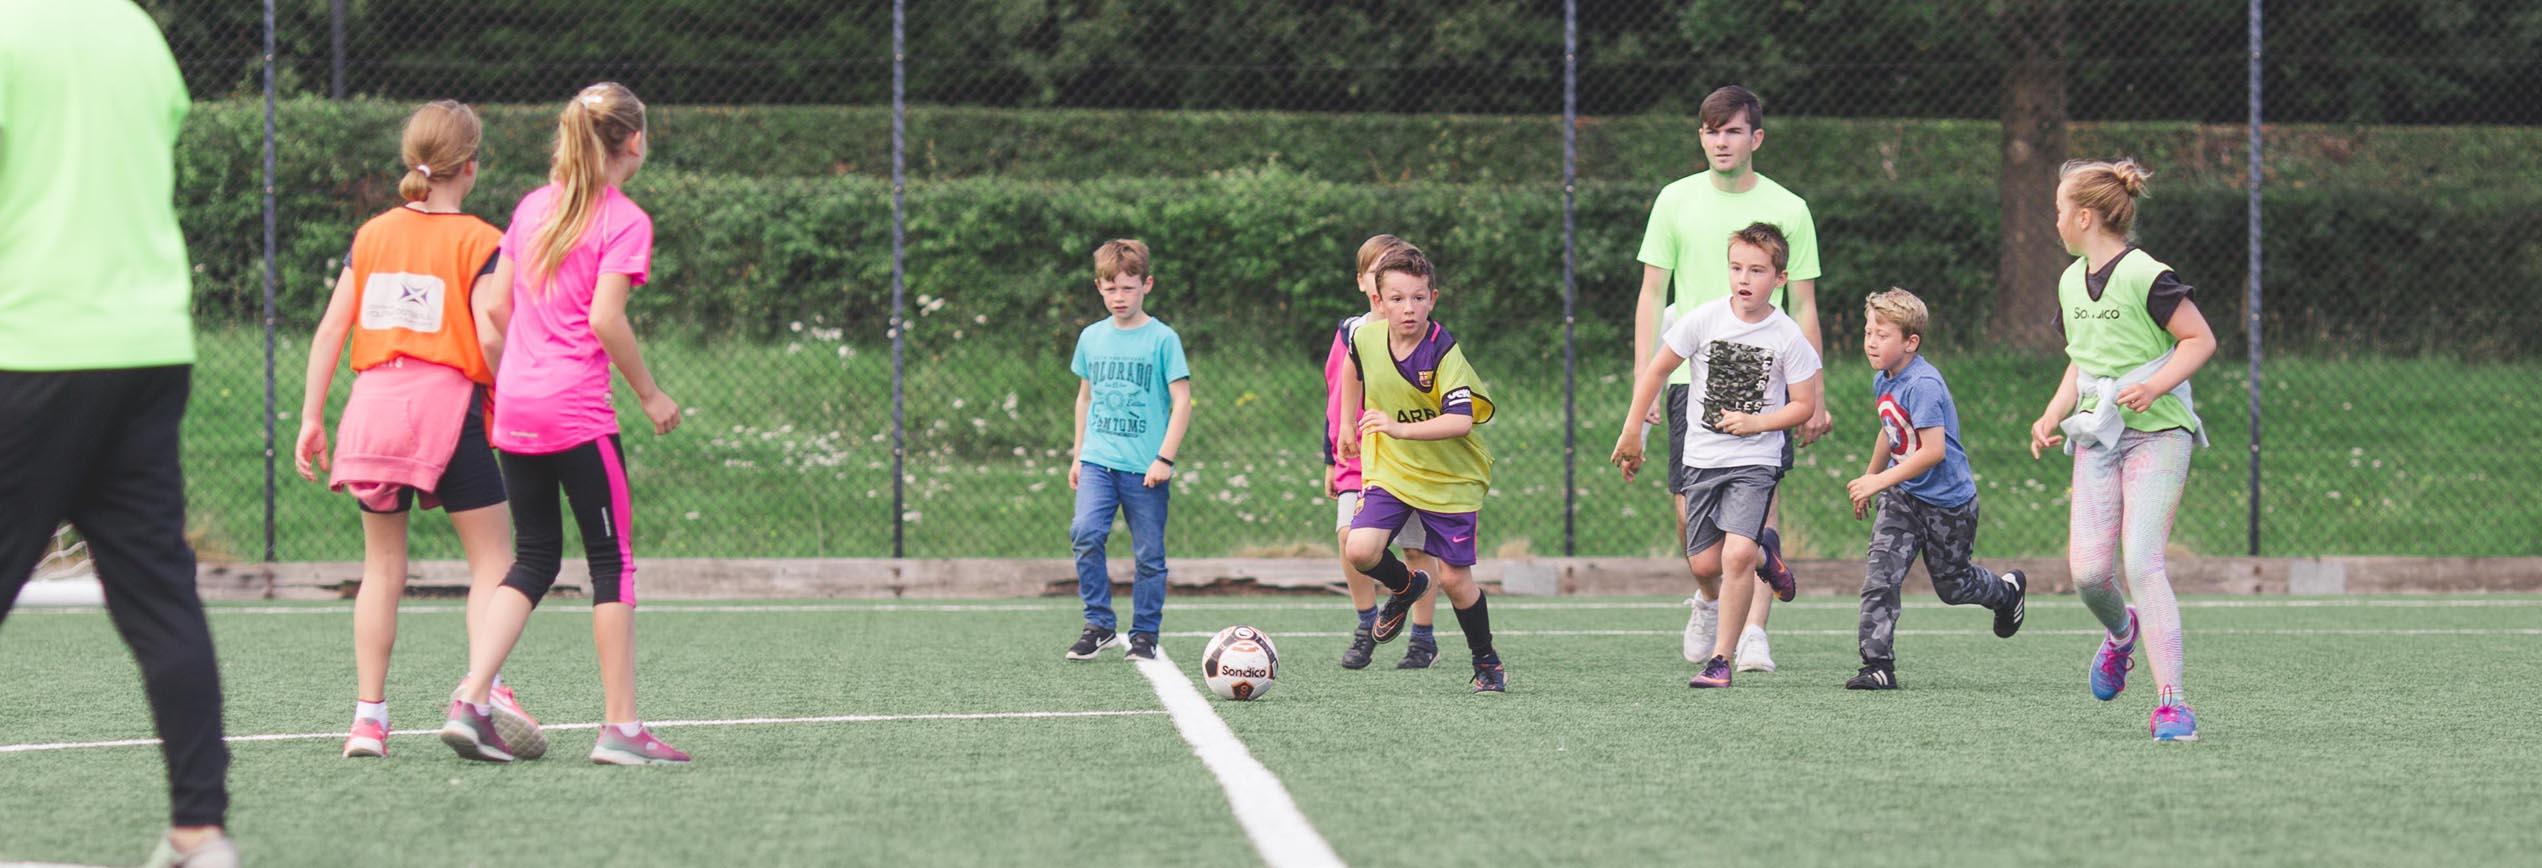 vision coaching sports camp Ayrshire